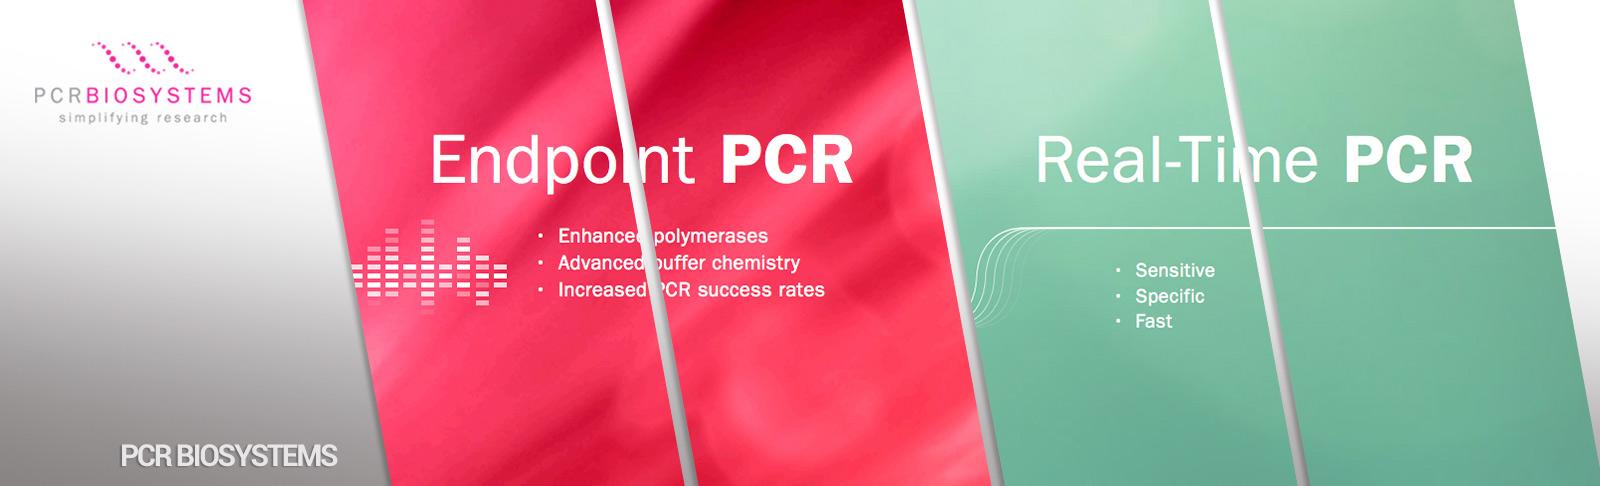 PCR-BIOSYSTEMS